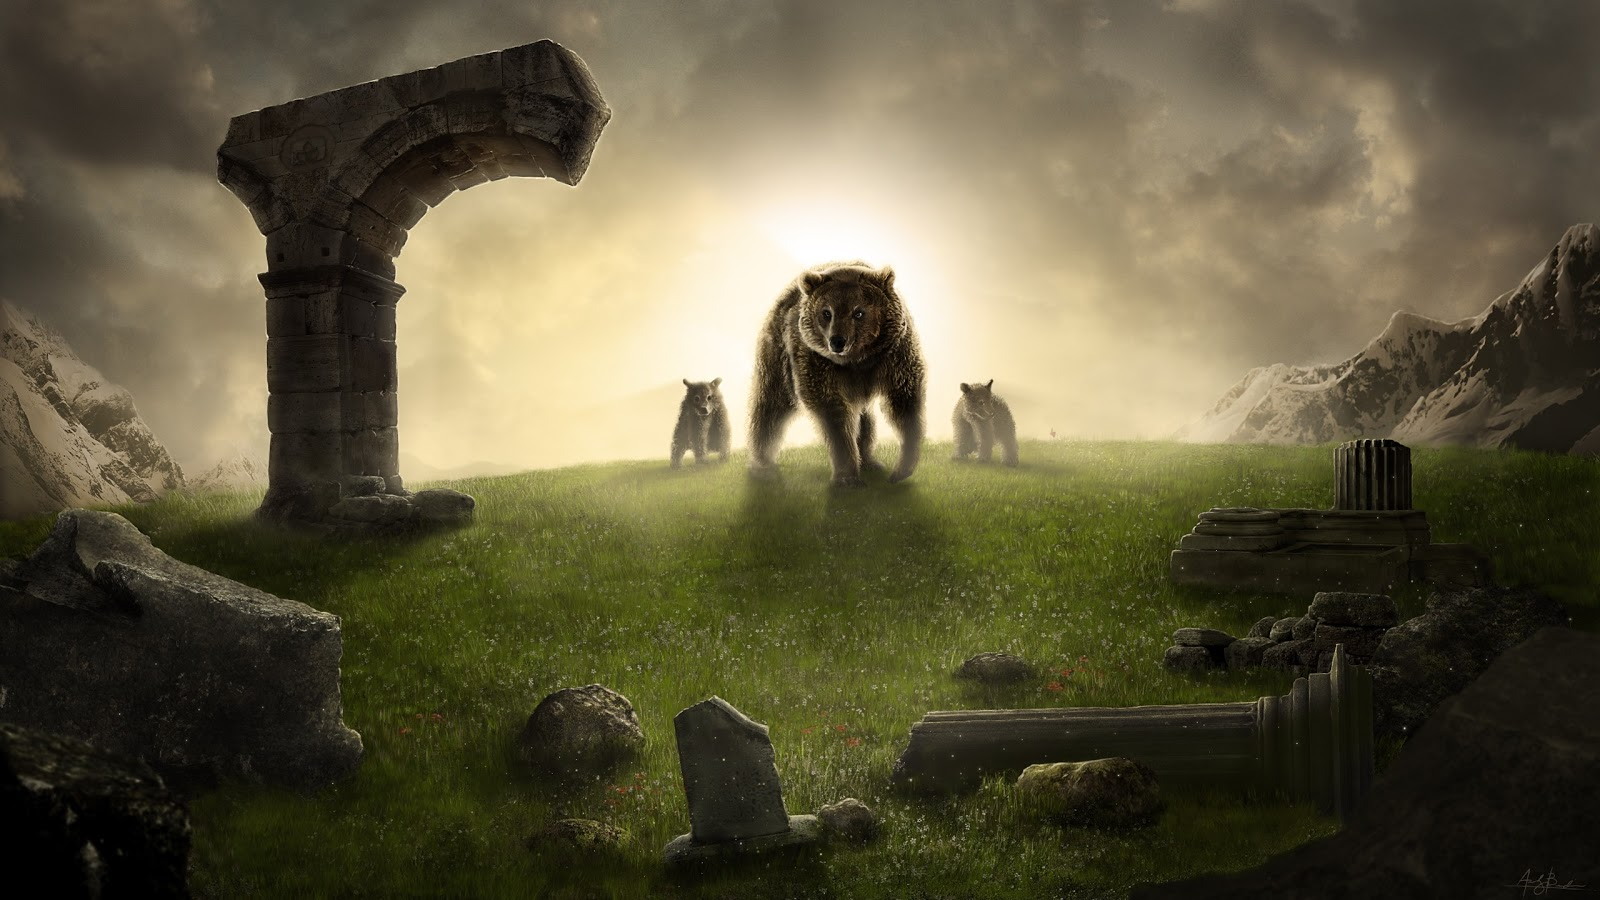 http://3.bp.blogspot.com/-W6kjc2oKTKk/UI_R1n5KI7I/AAAAAAAAAD4/1BZYlNFbCU8/s1600/Fantastic-World-of-Animals-Fantasy-HD-Wallpapers.jpg